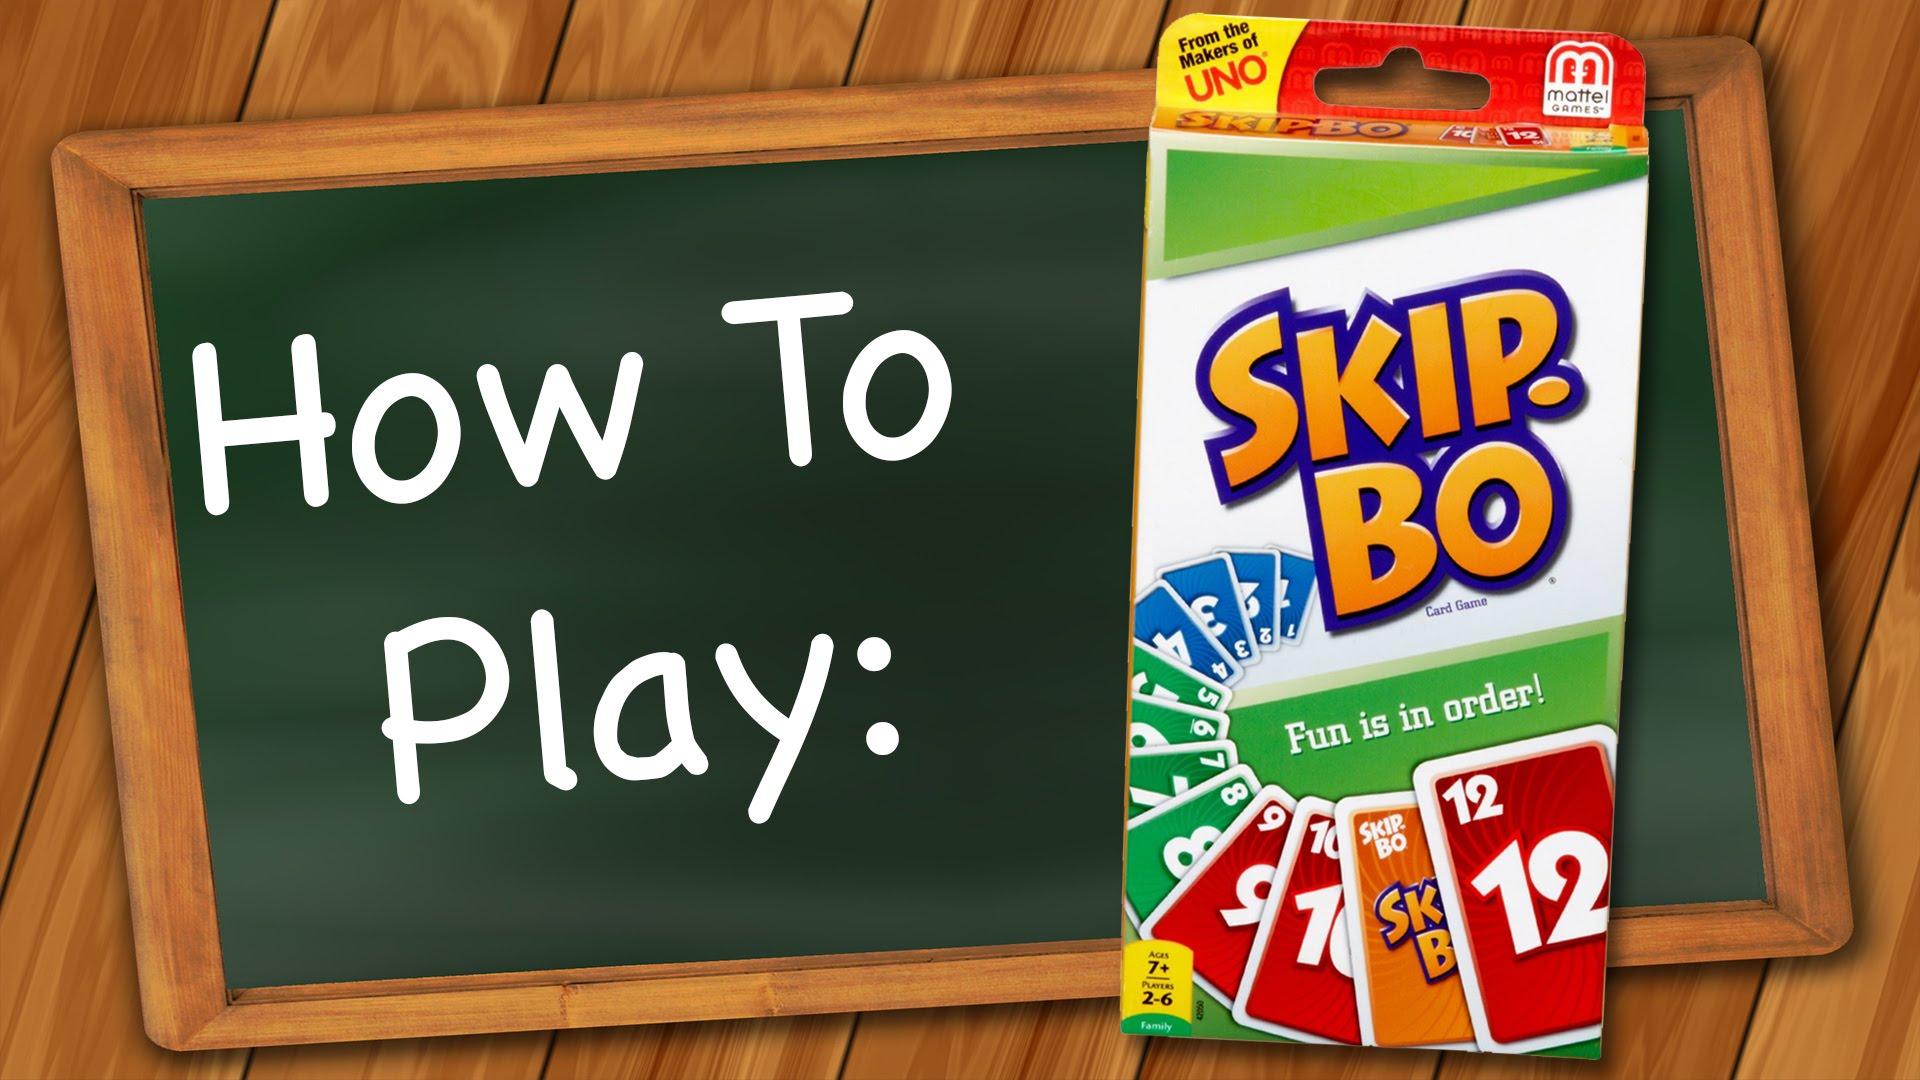 skip bo instructions